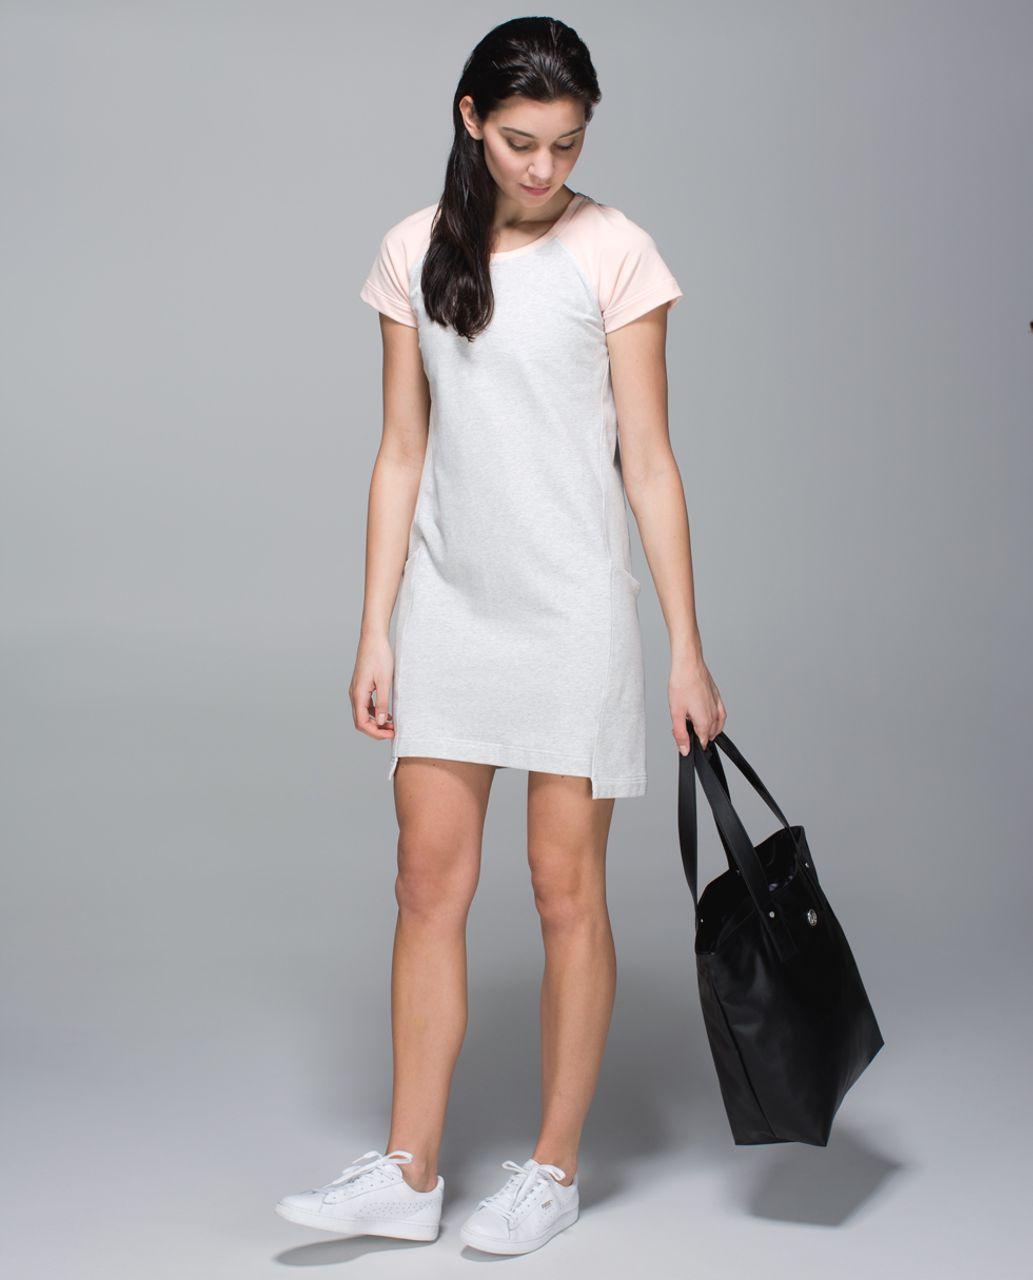 Lululemon Cut Above Dress - Heathered White / Butter Pink